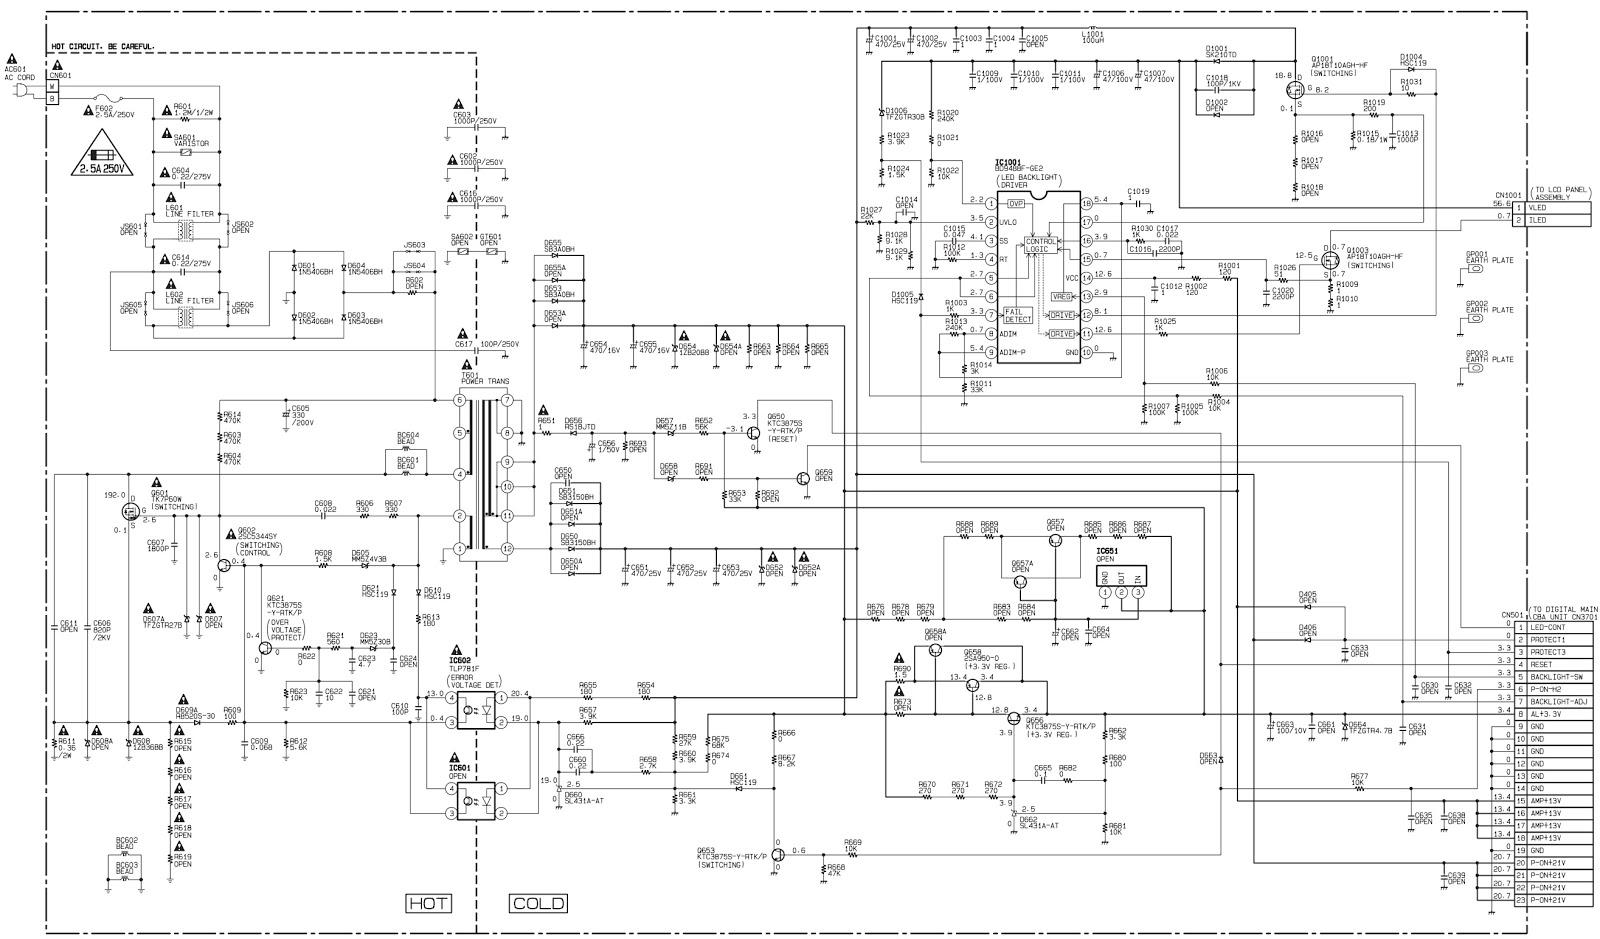 Magnavox Wiring Diagram Hvac Diagrams Sincgars Radio Plug Schematic 2019 On Configurations